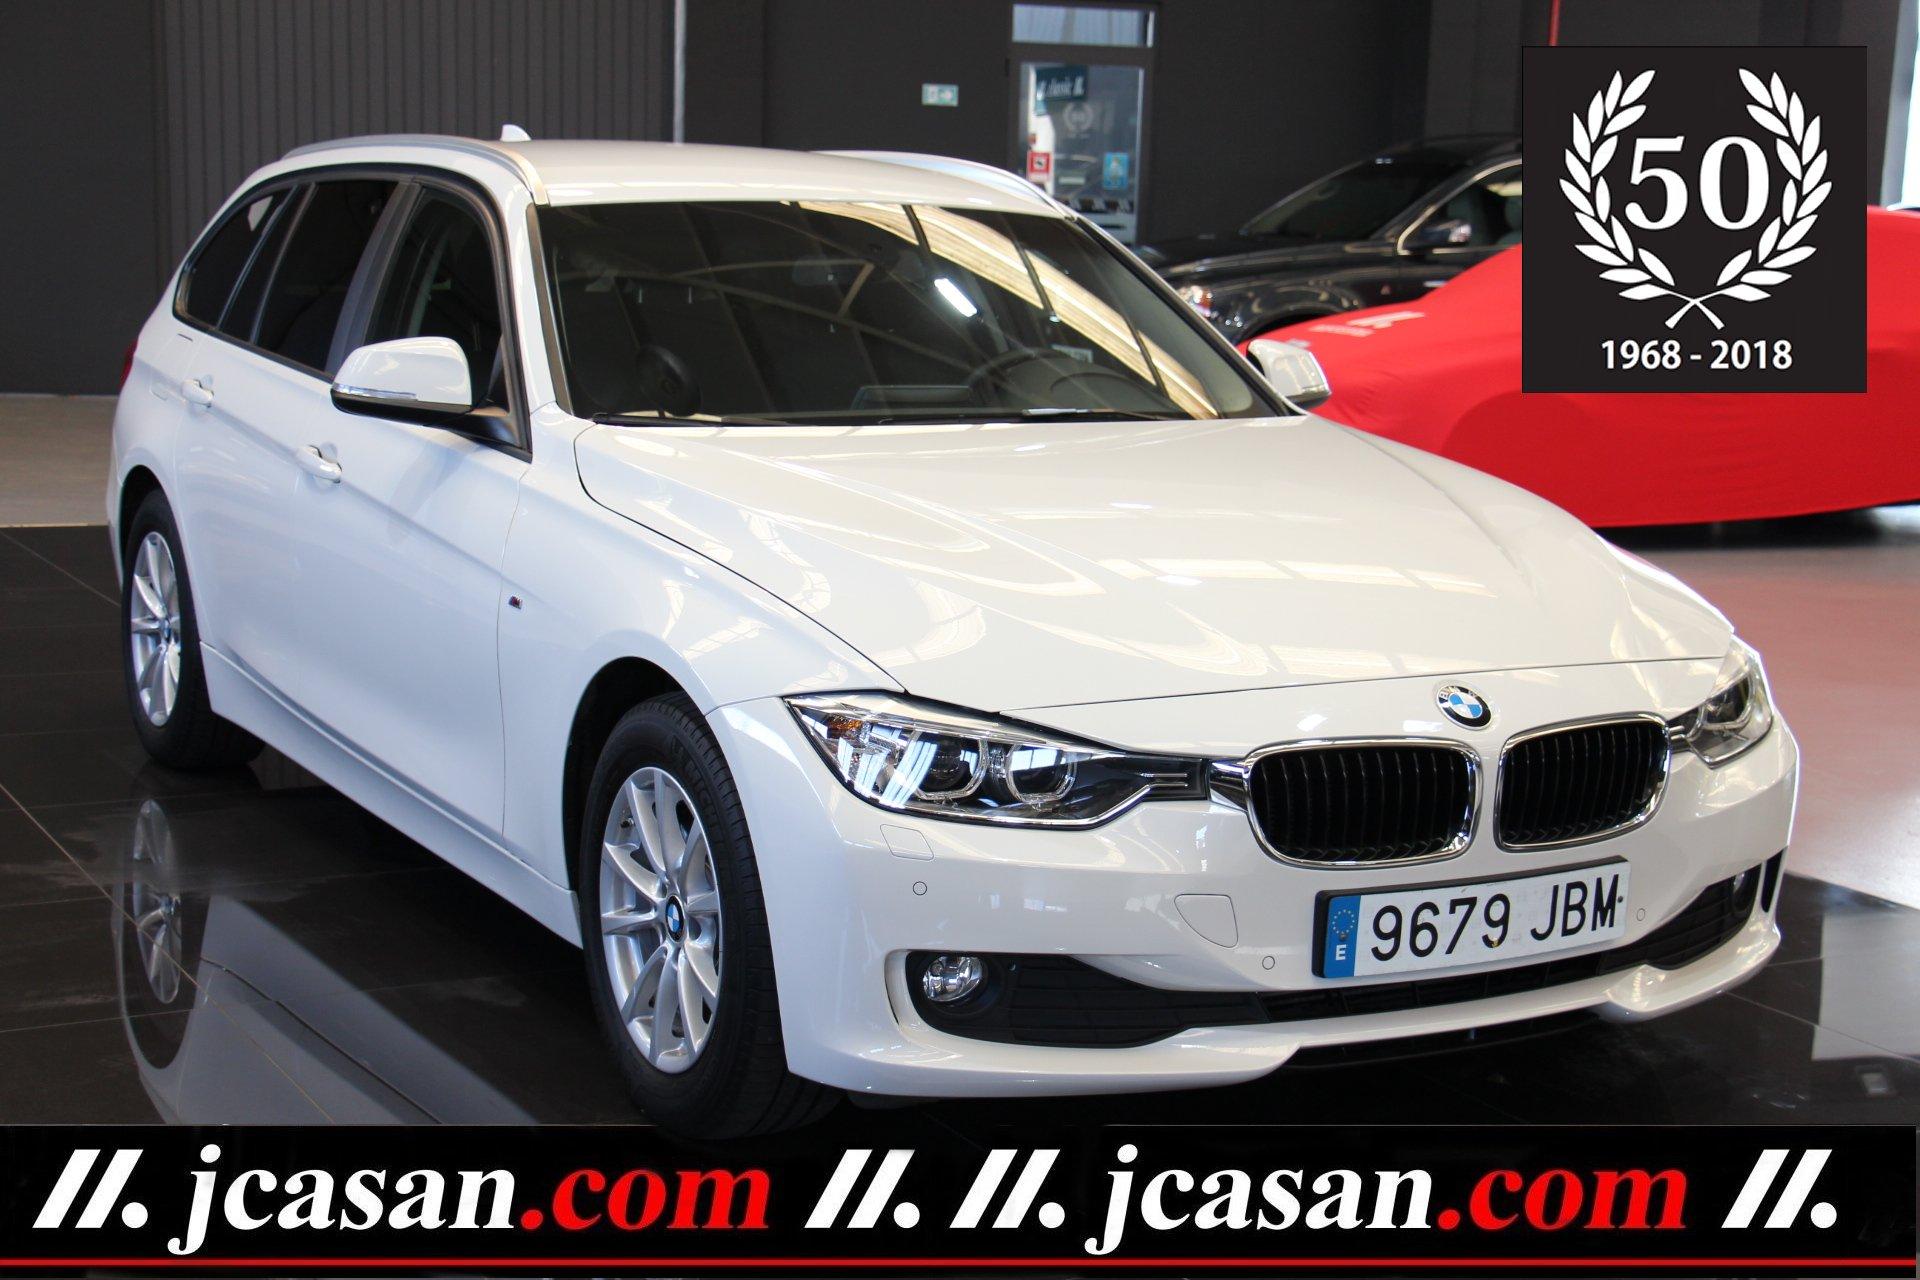 BMW 318d 143 CV 6 Vel Touring